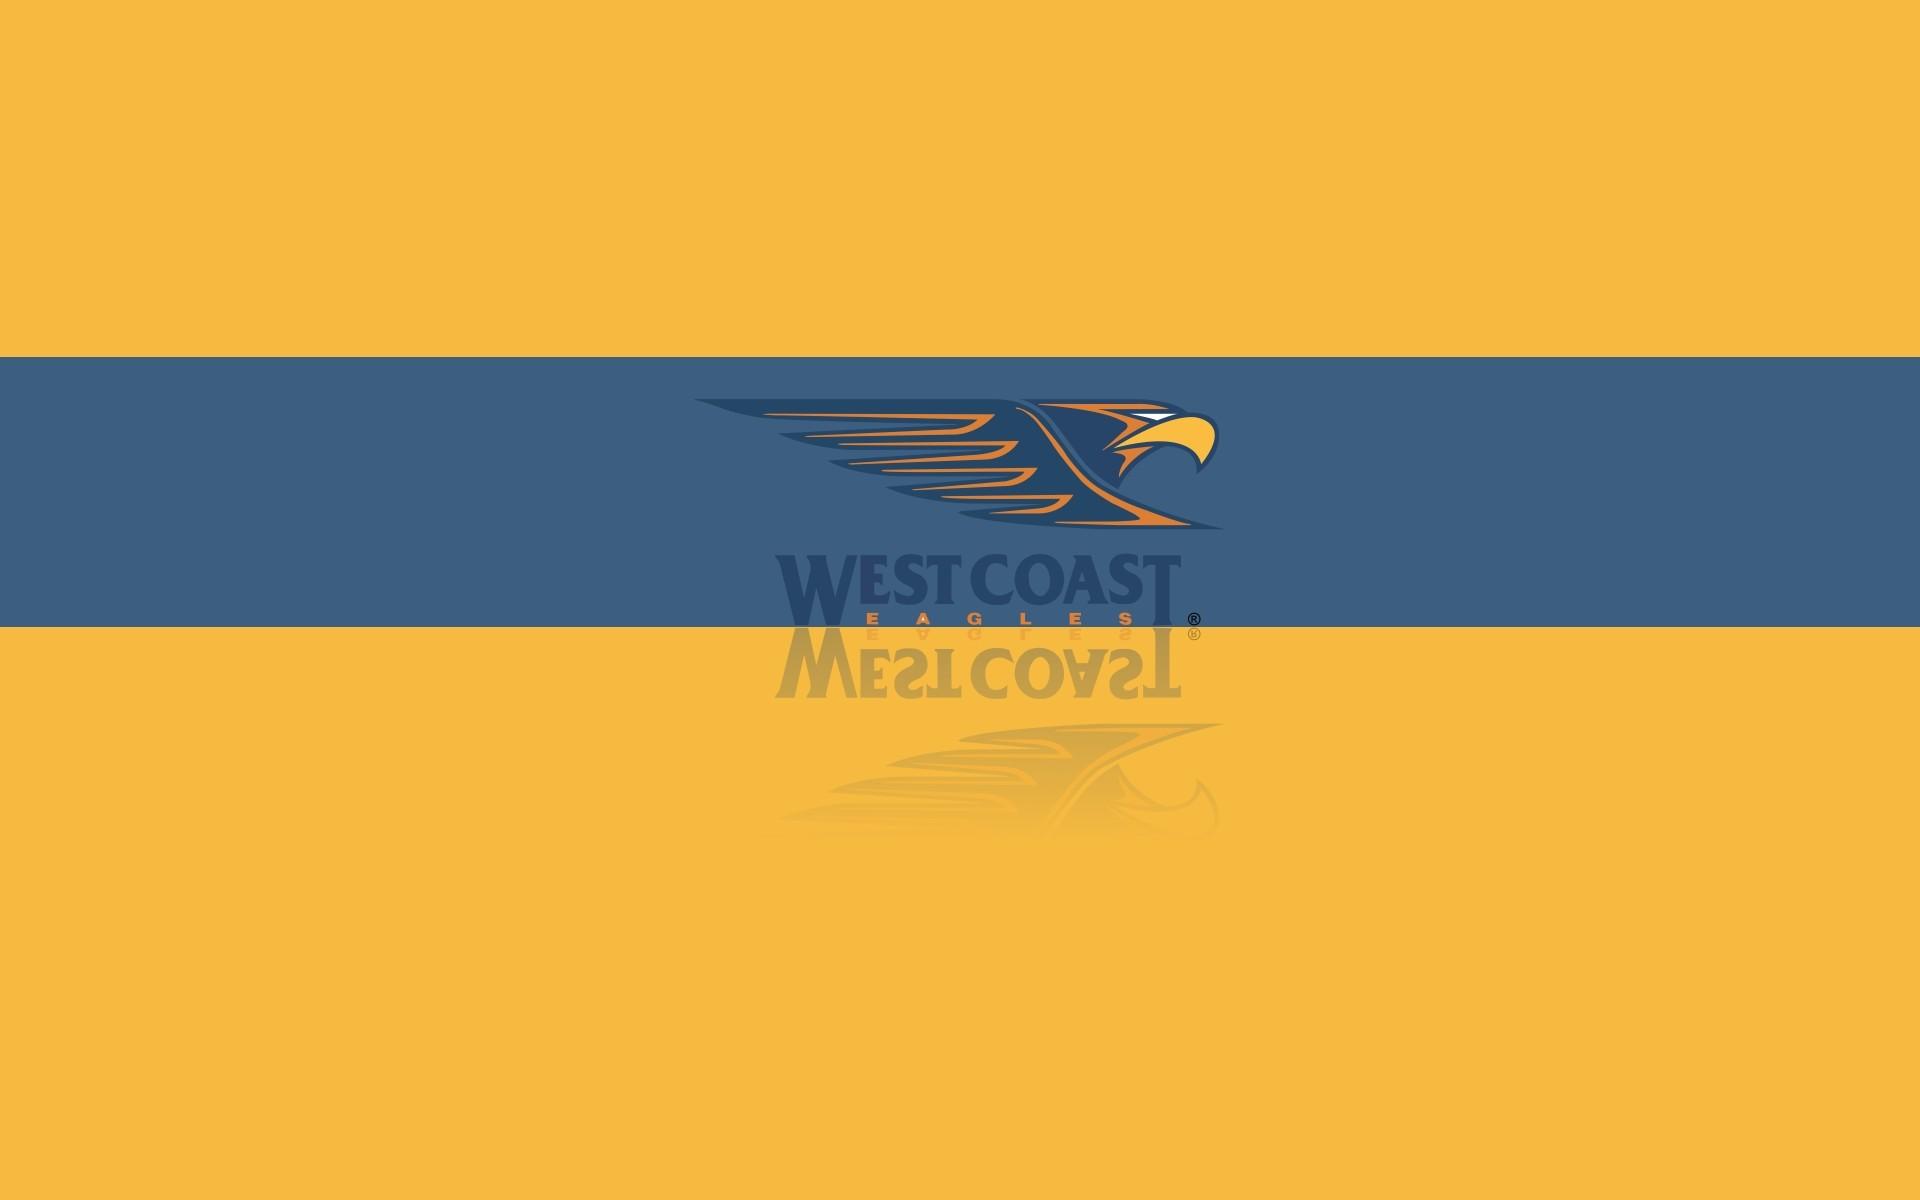 Res: 1920x1200, West Coast Eagles FC wallpaper, desktop background with team logo -  px